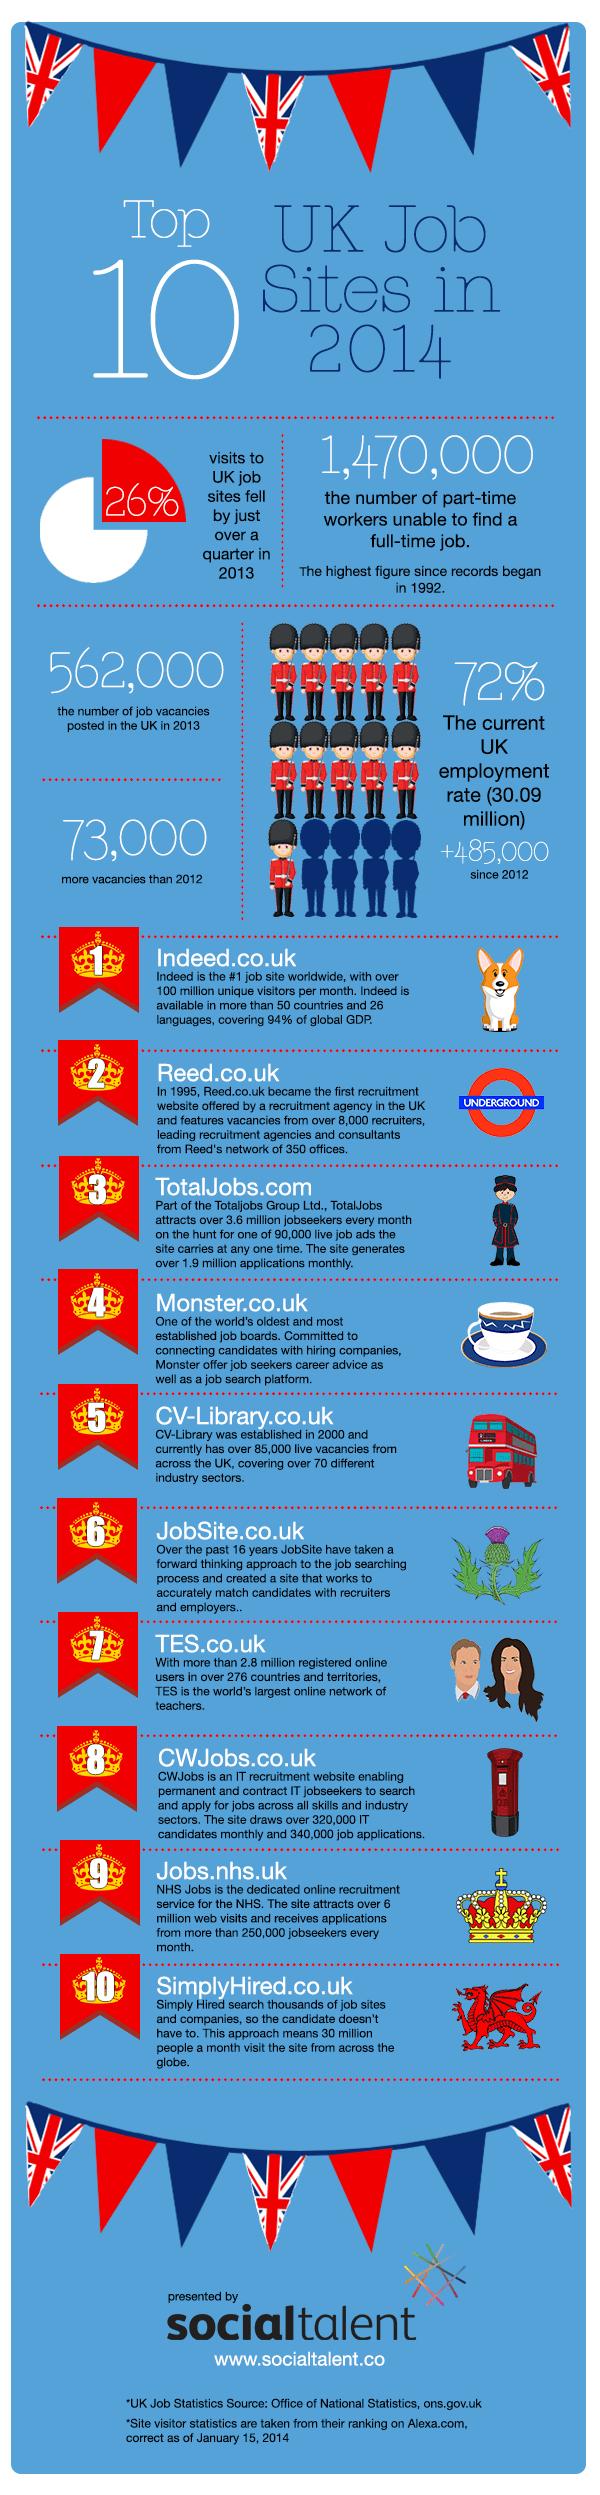 Top-10-UK-Job-Boards-(Infographic)